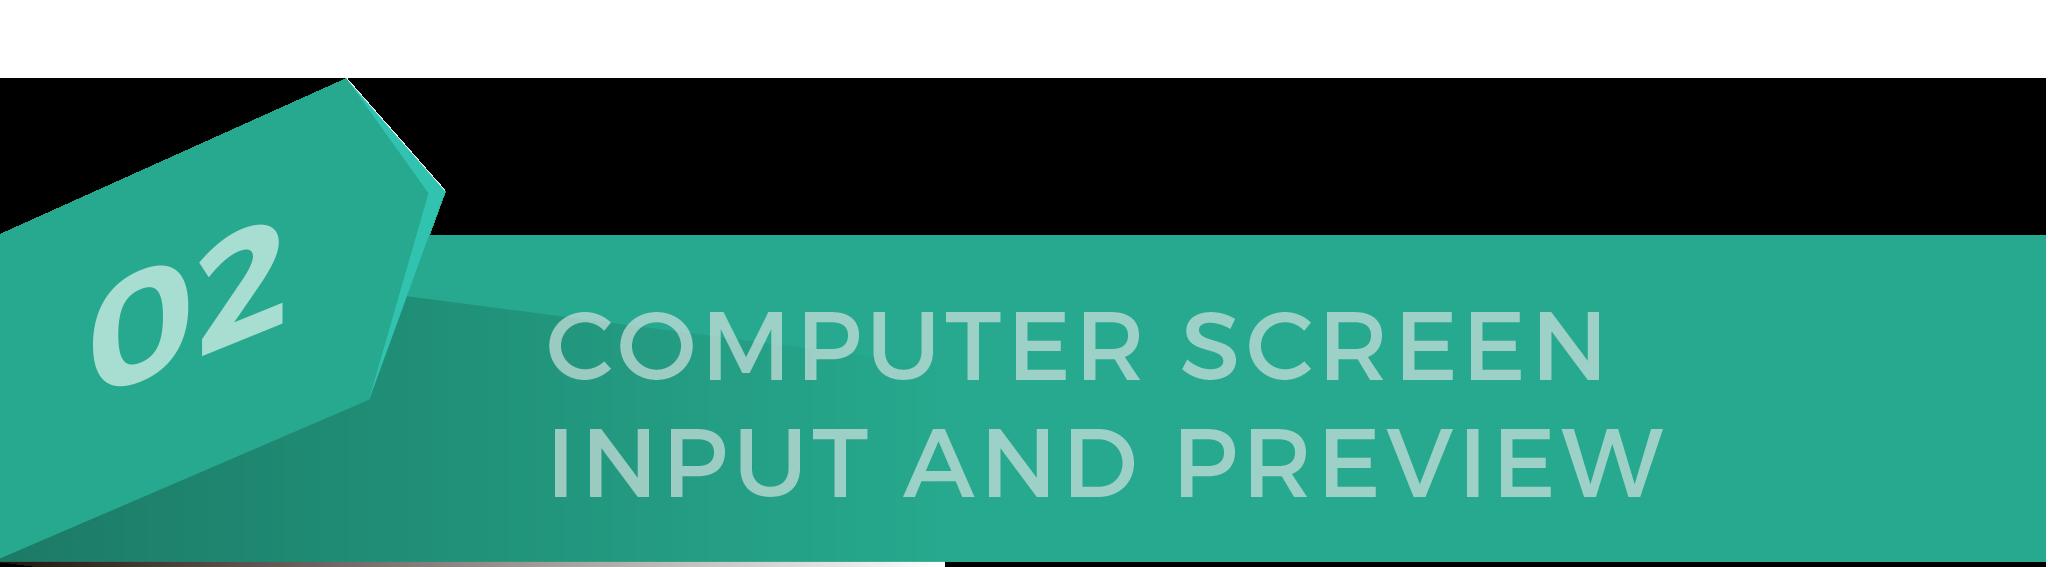 02-computerscreen